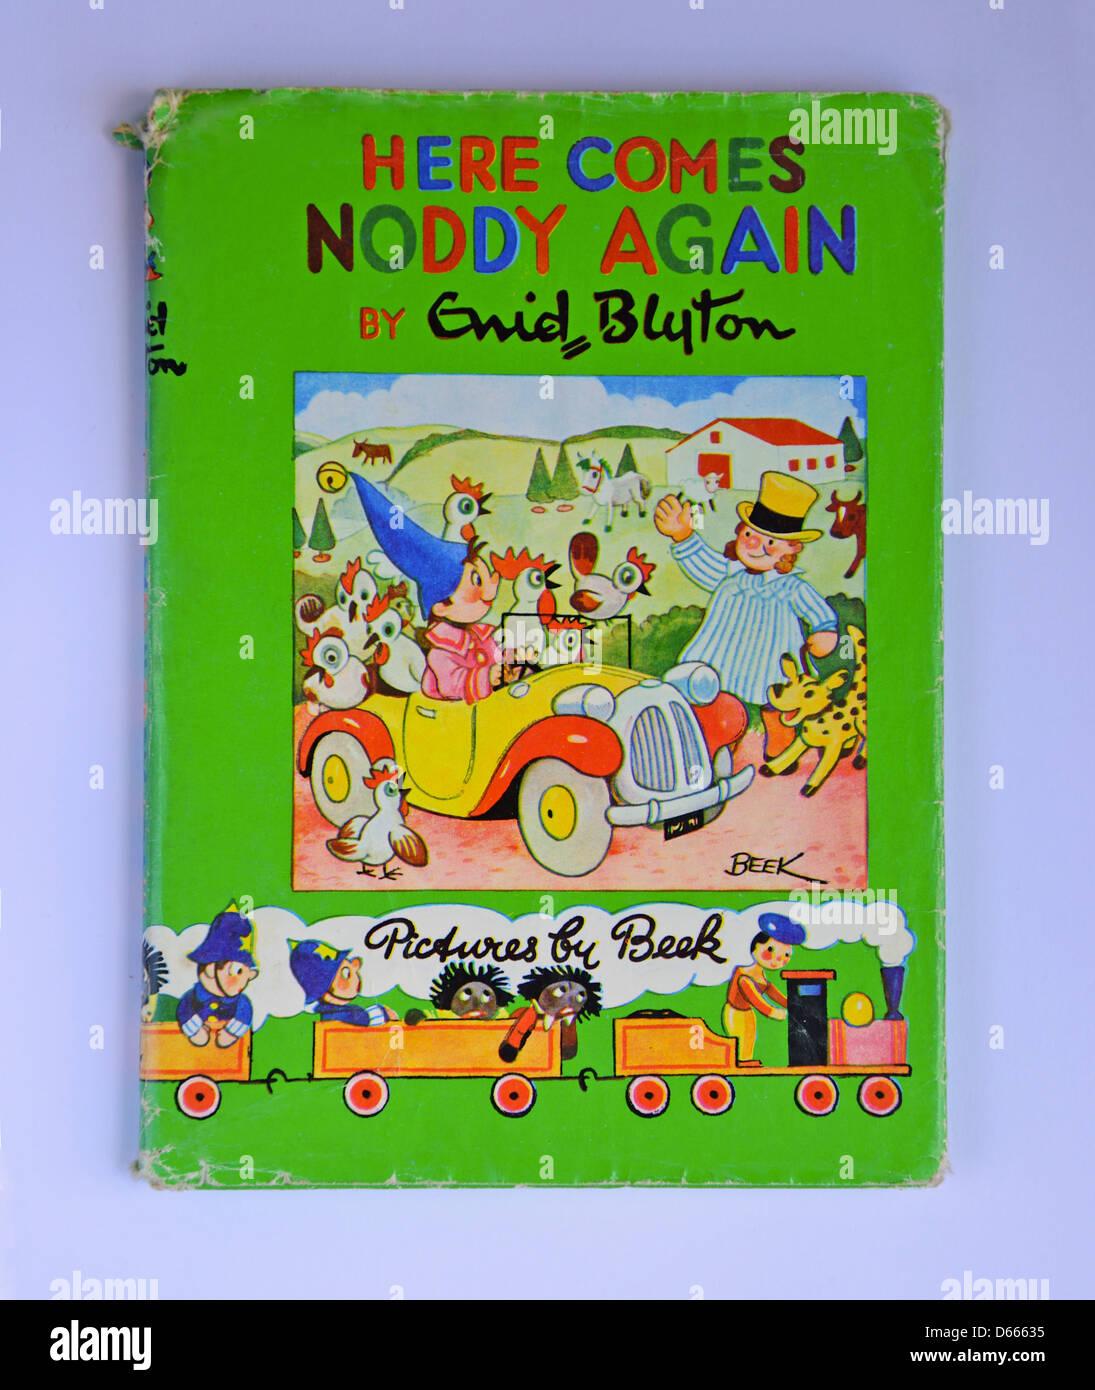 Enid Blyton's 'Here comes Noddy again' Noddy book, Ascot, Windsor, Berkshire, England, United Kingdom - Stock Image